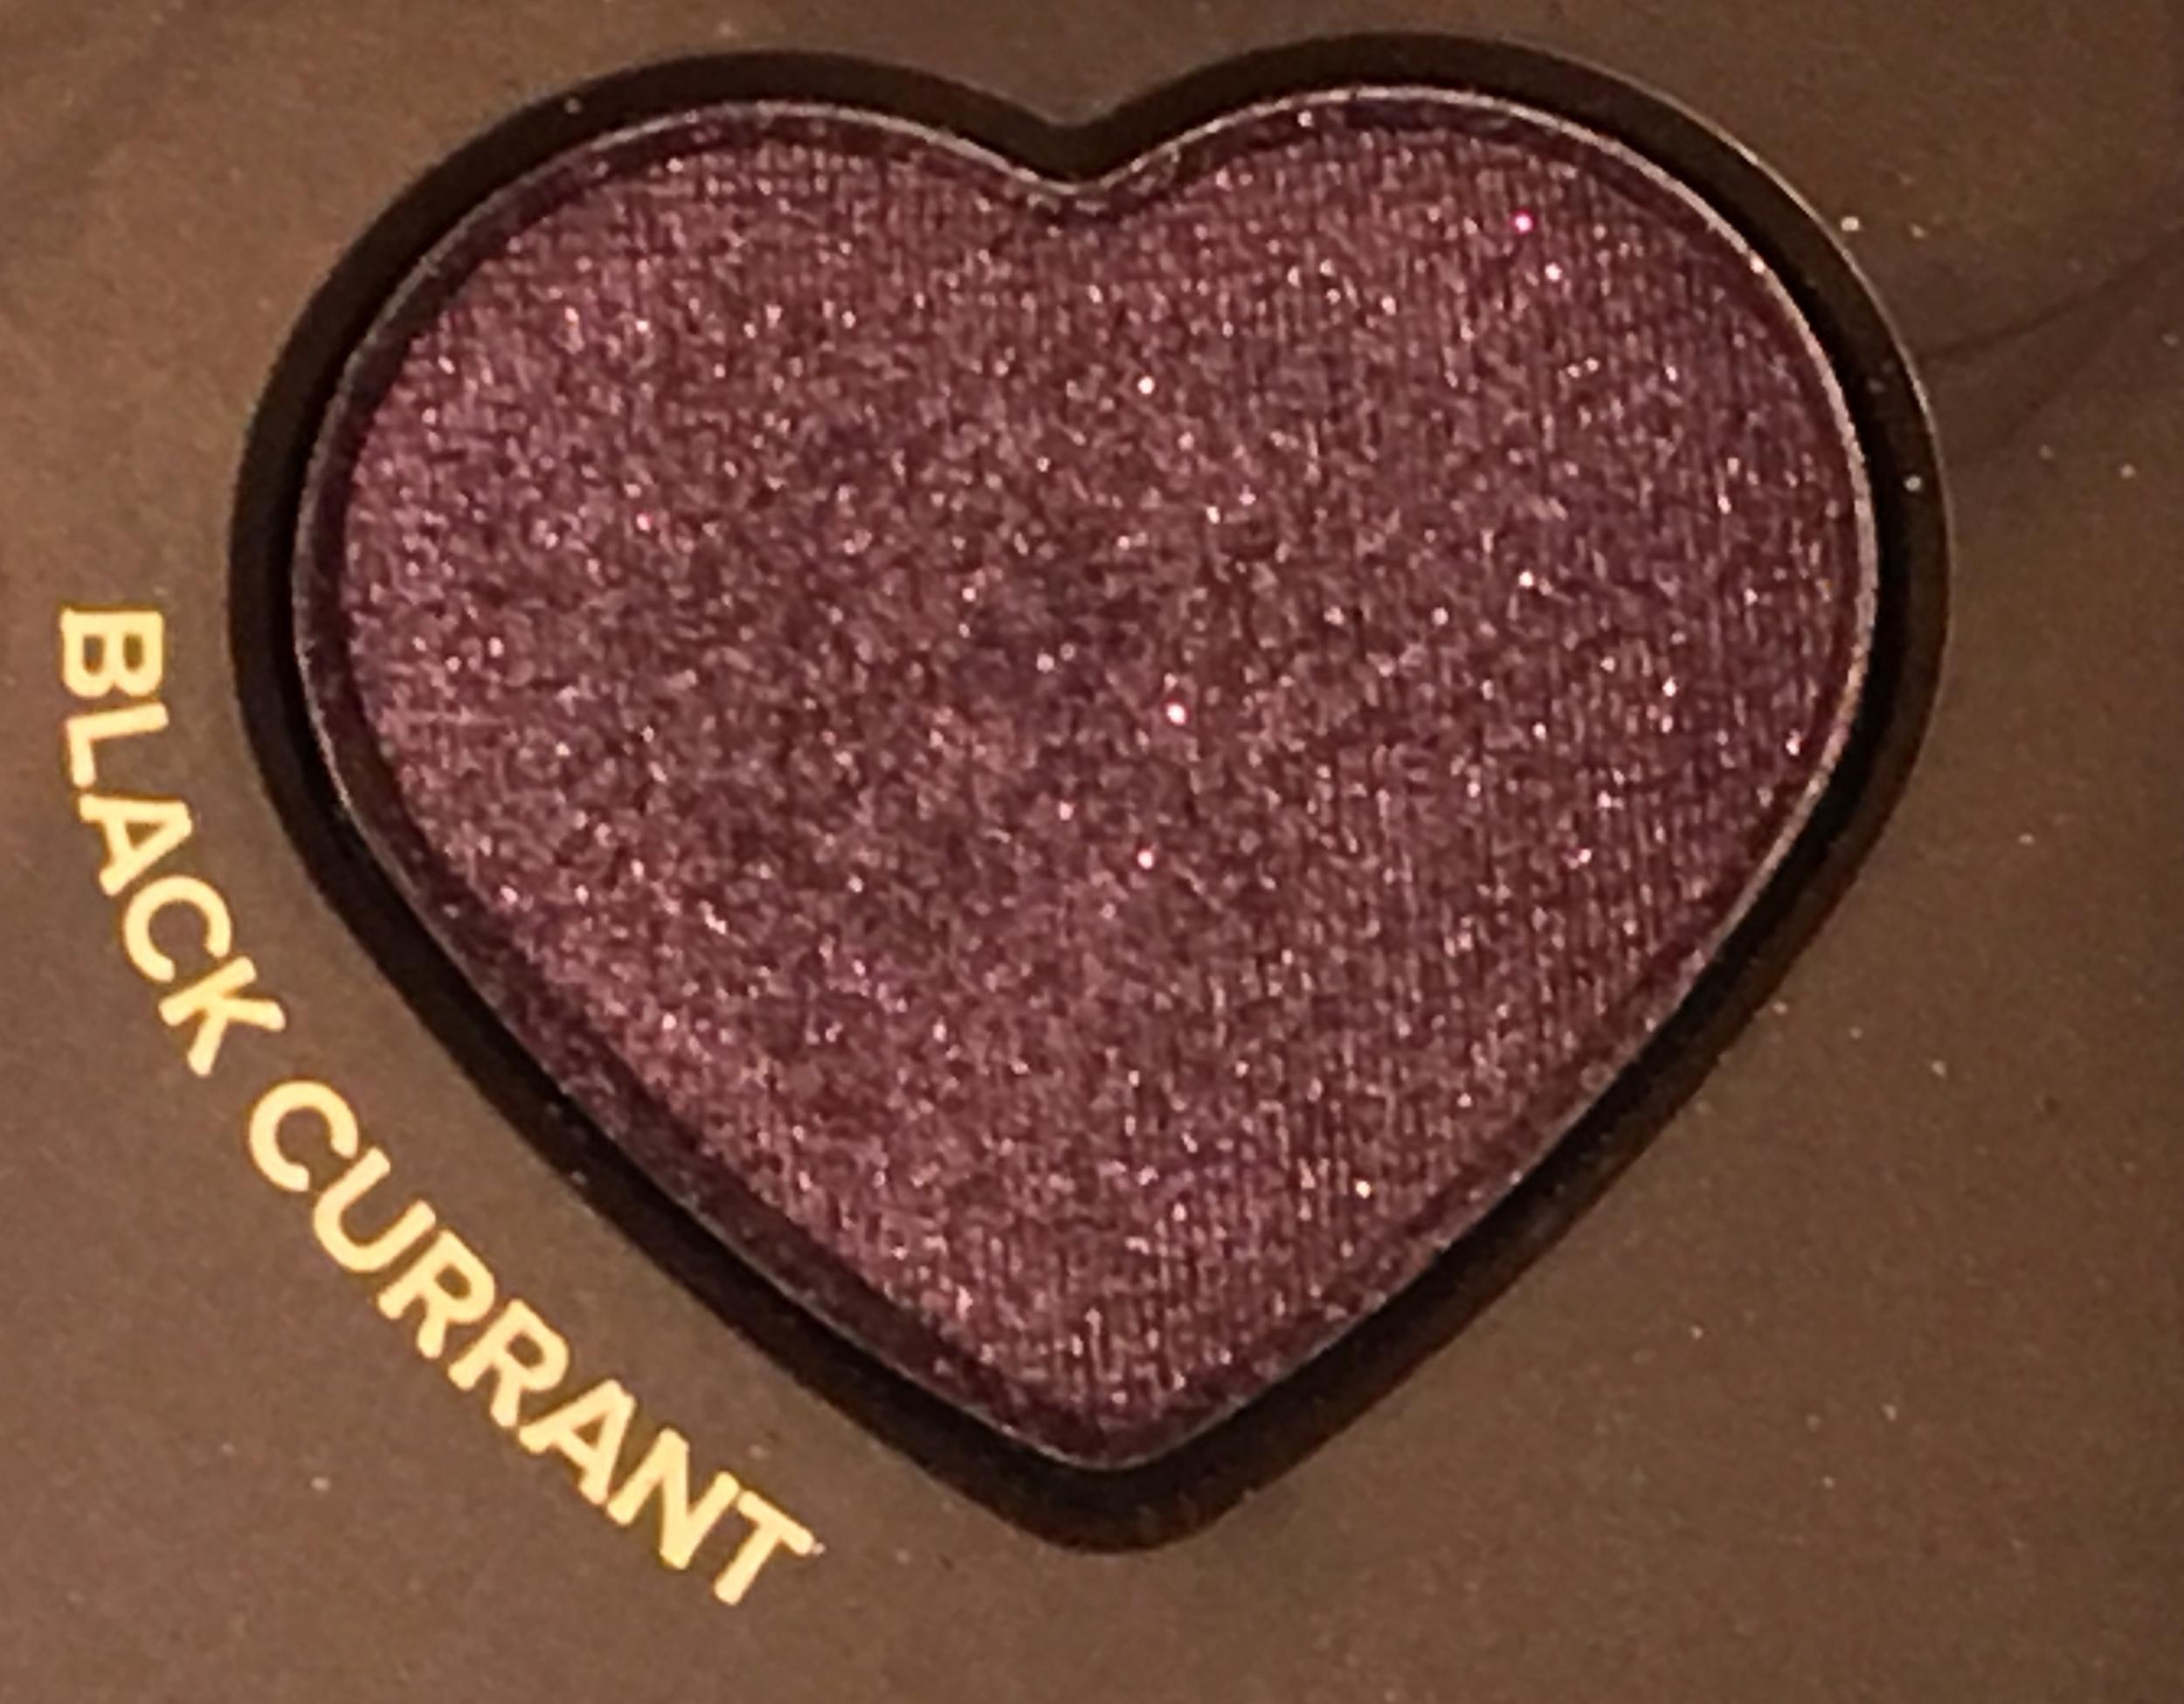 Black Currant (Deep Metallic Amethyst)